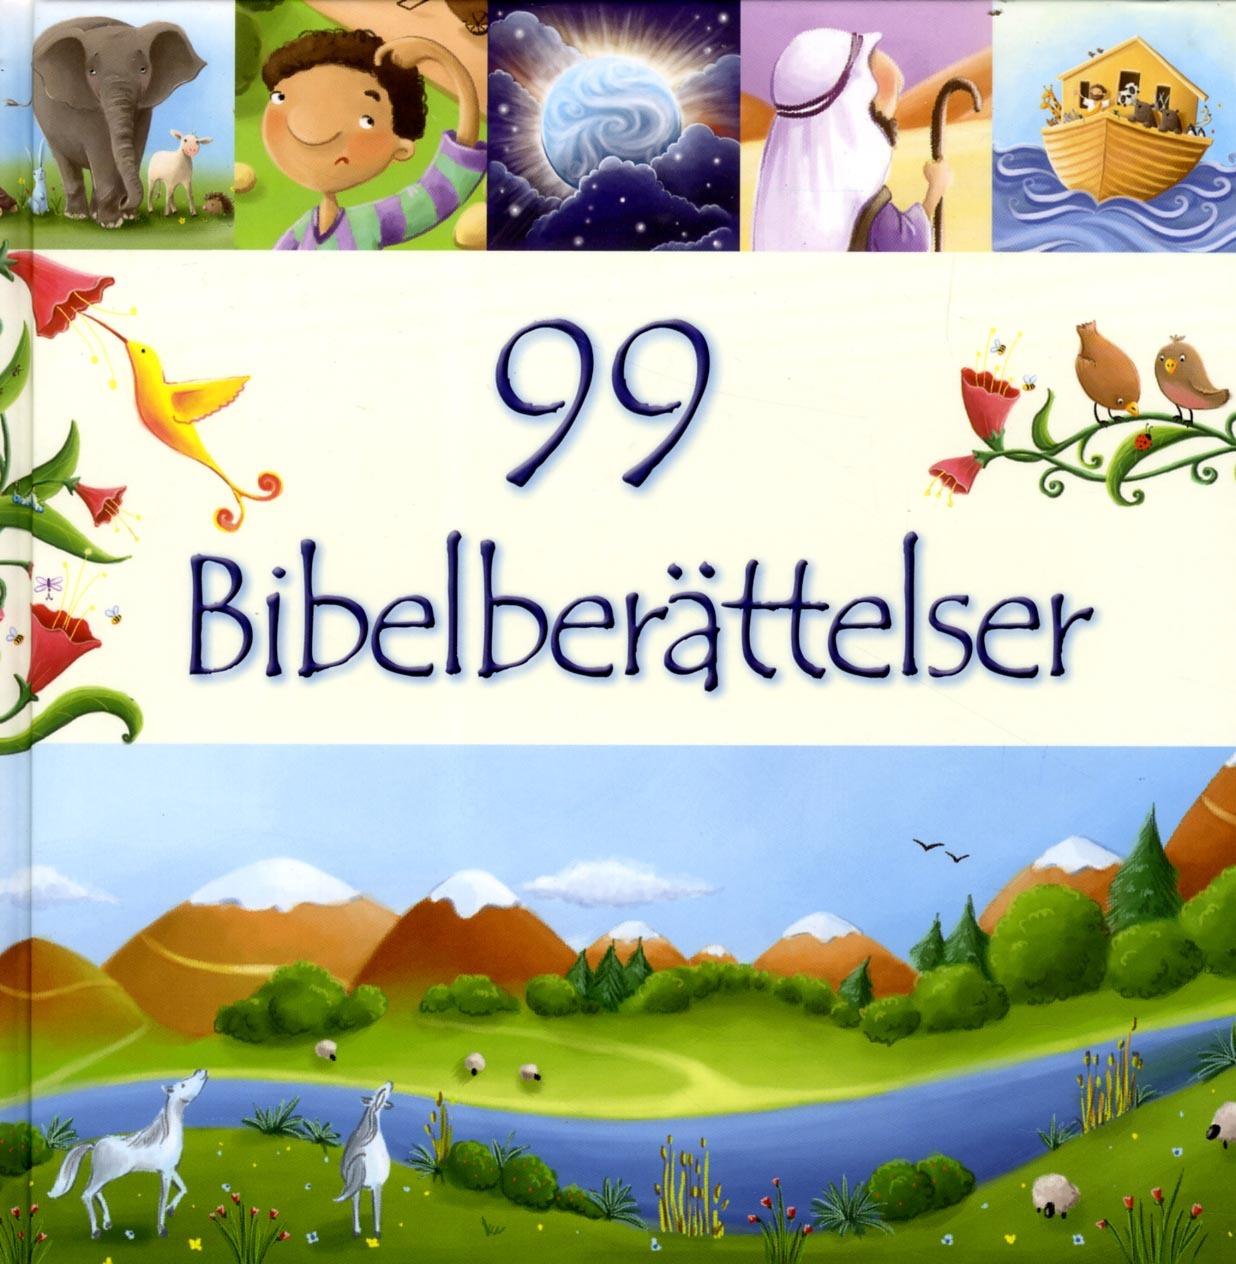 Image for 99 Bibelberättelser from Suomalainen.com